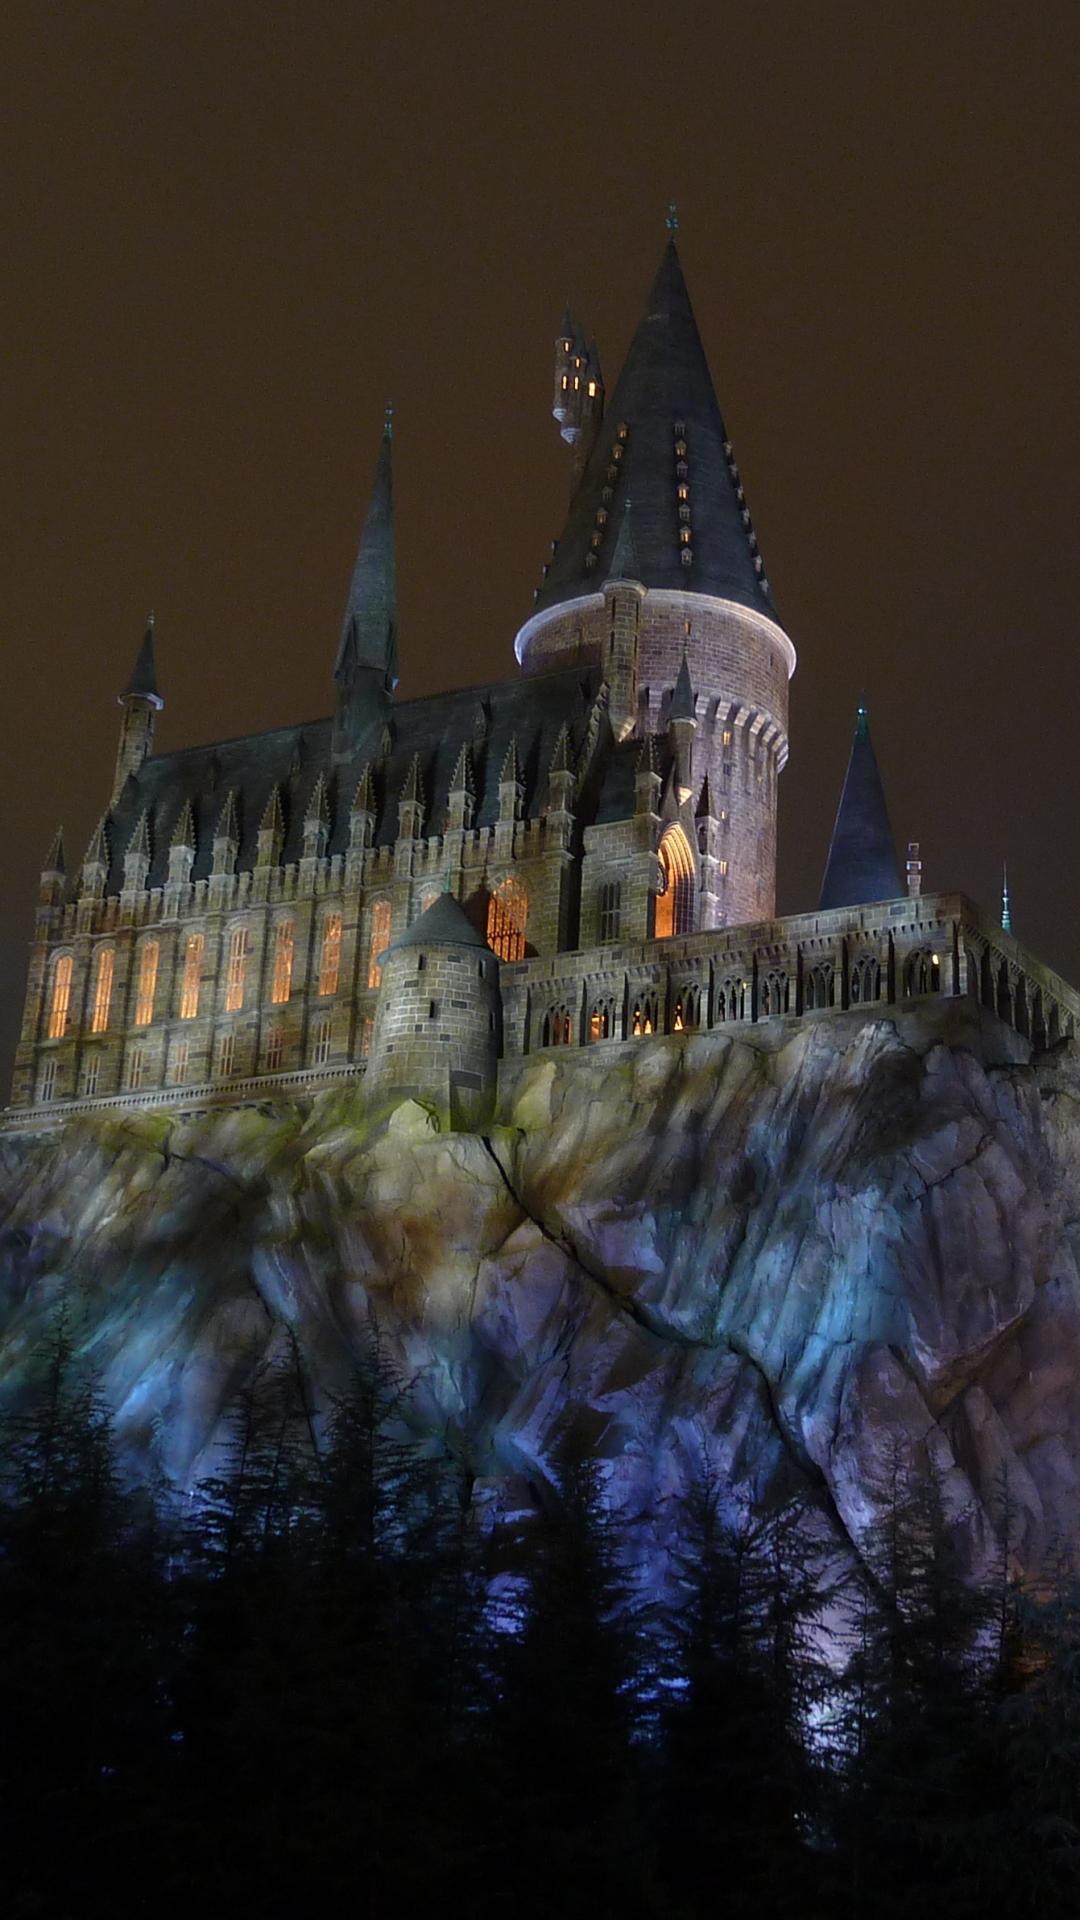 Harry Potter Mobile Wallpaper Hogwarts - HD Wallpaper